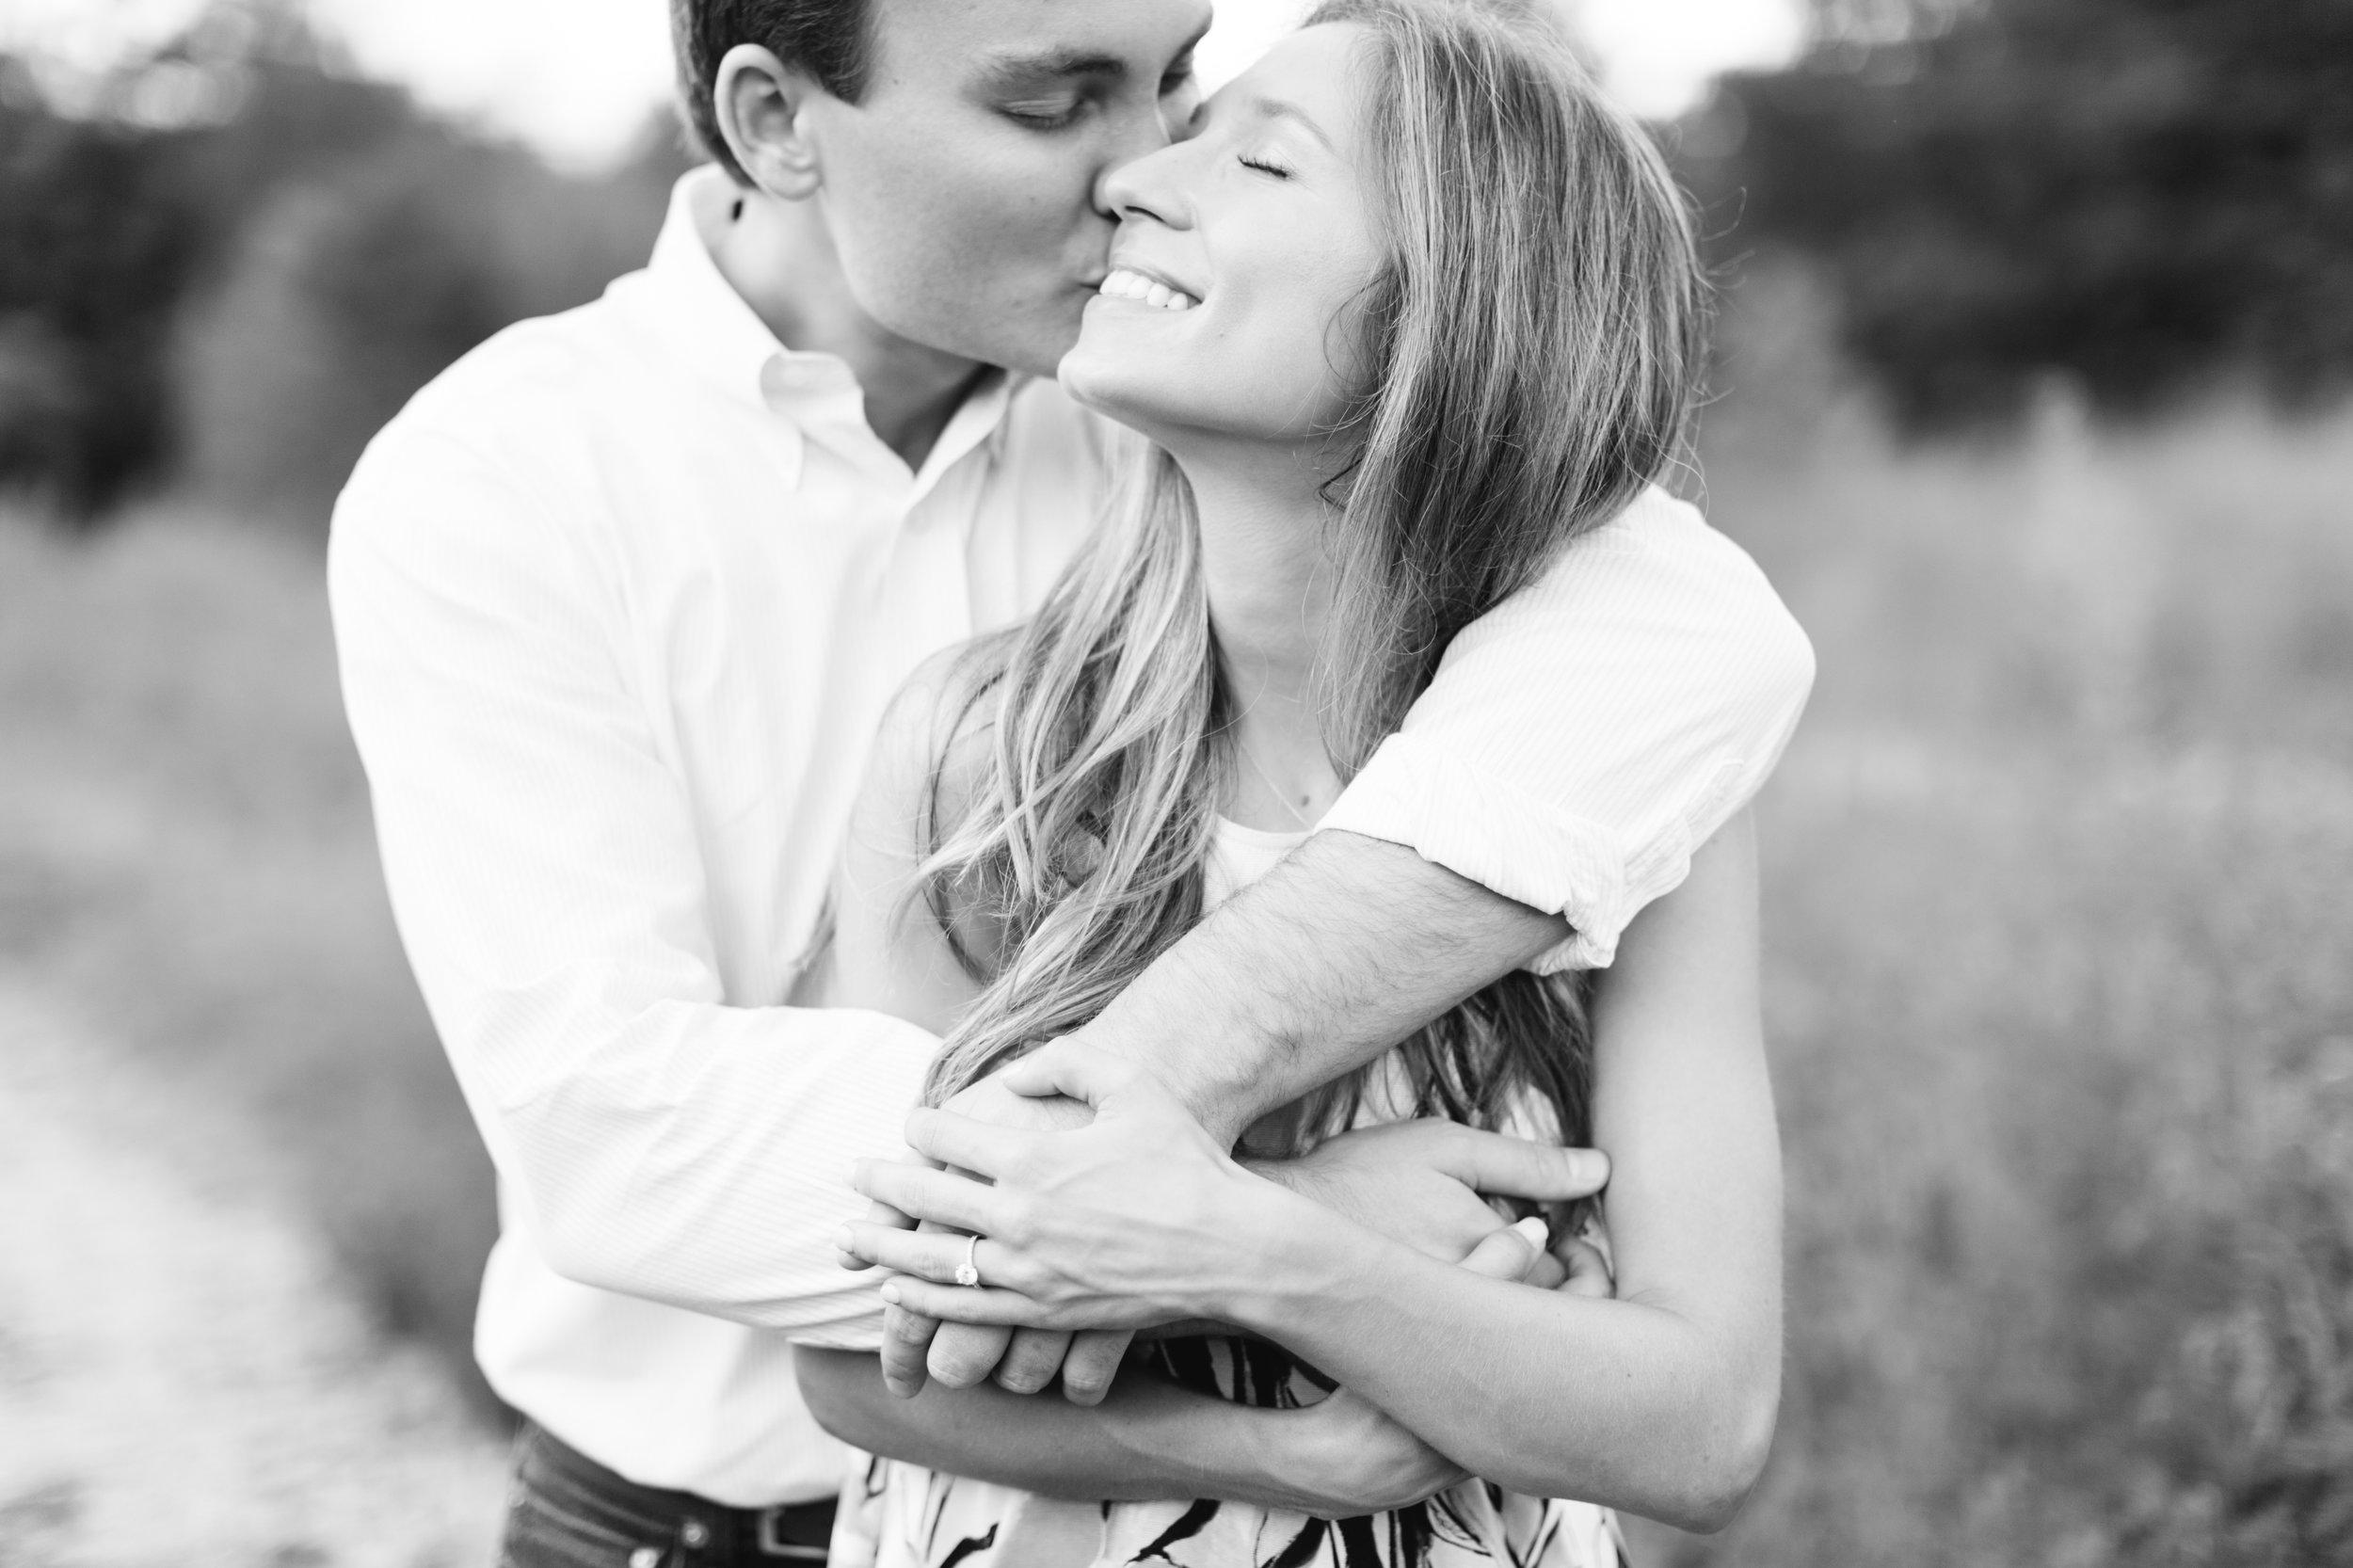 Olivia_Patrick_Engagement_Abigail_Malone_Photography-135 (1).jpg